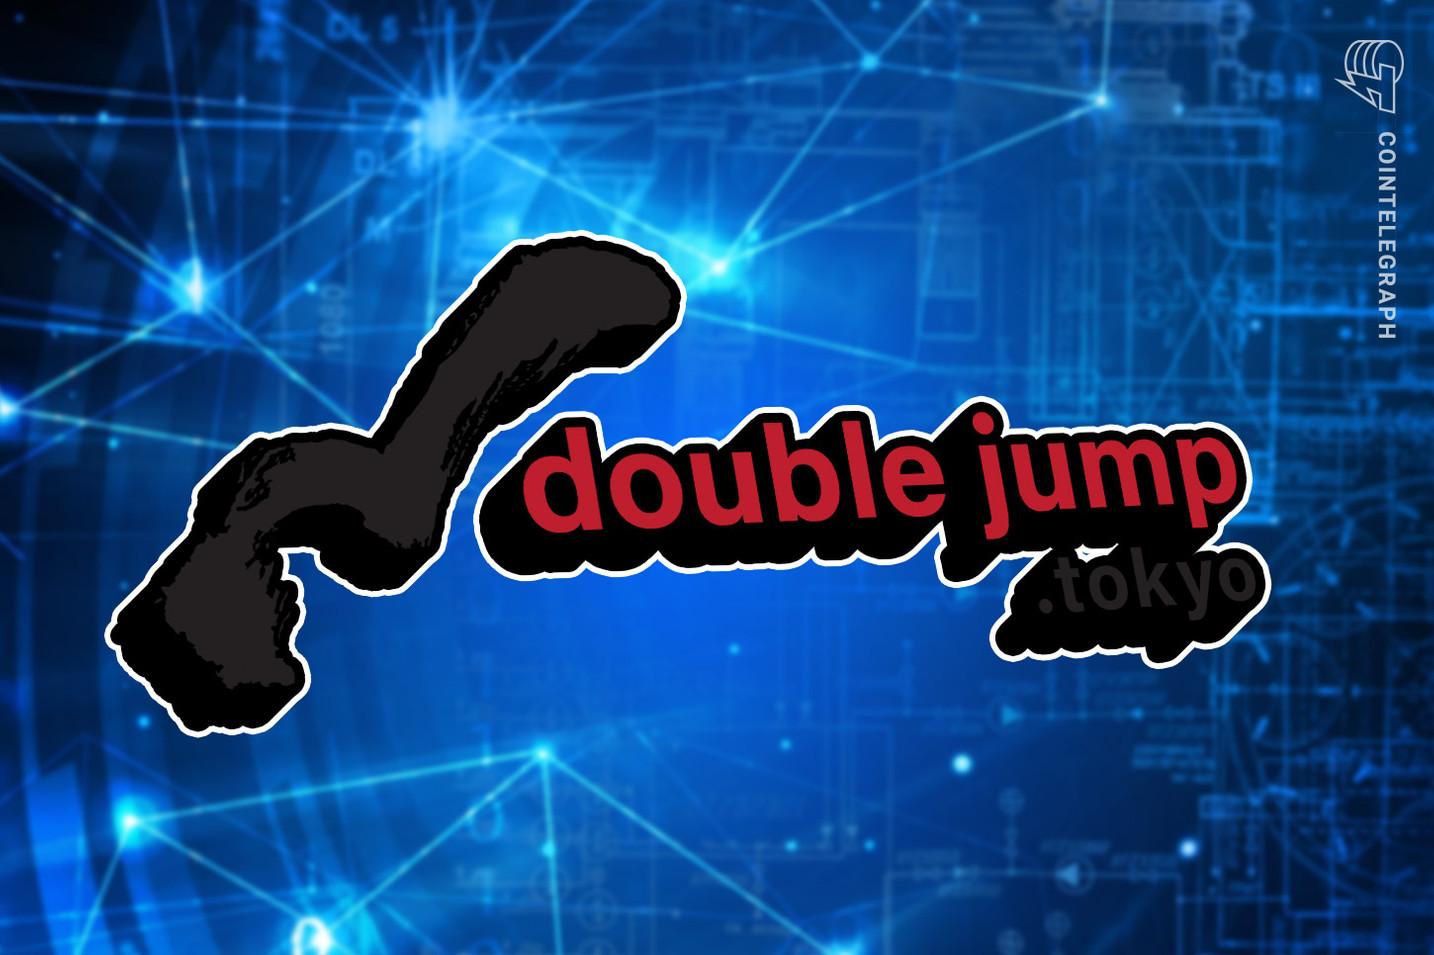 Double jump.tokyo and Square Enix  co-develop NFT content